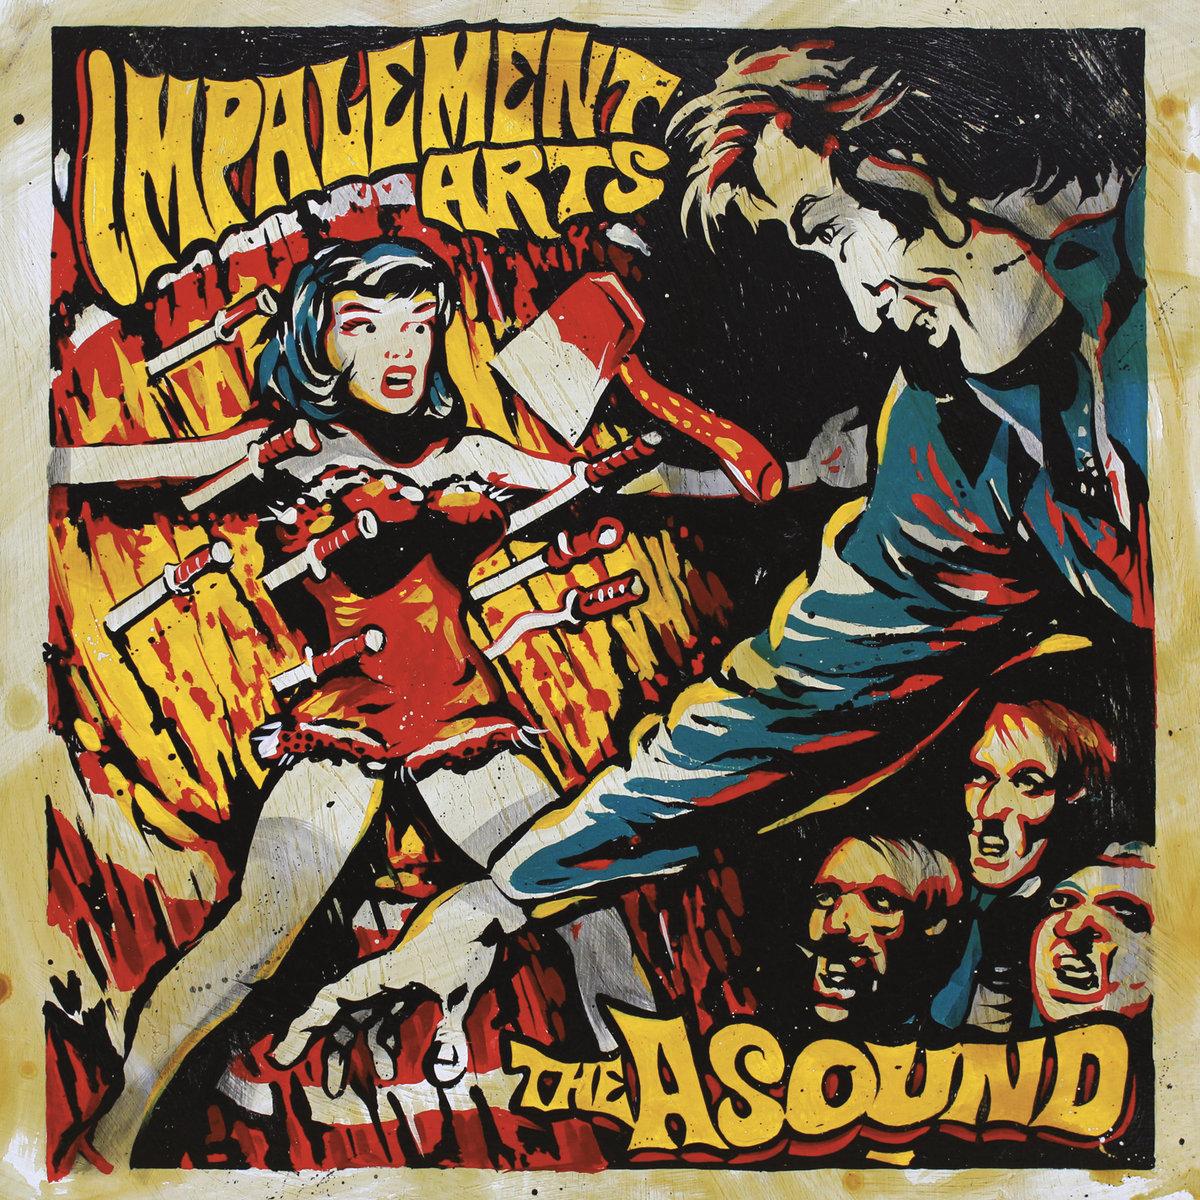 the asound impalement arts